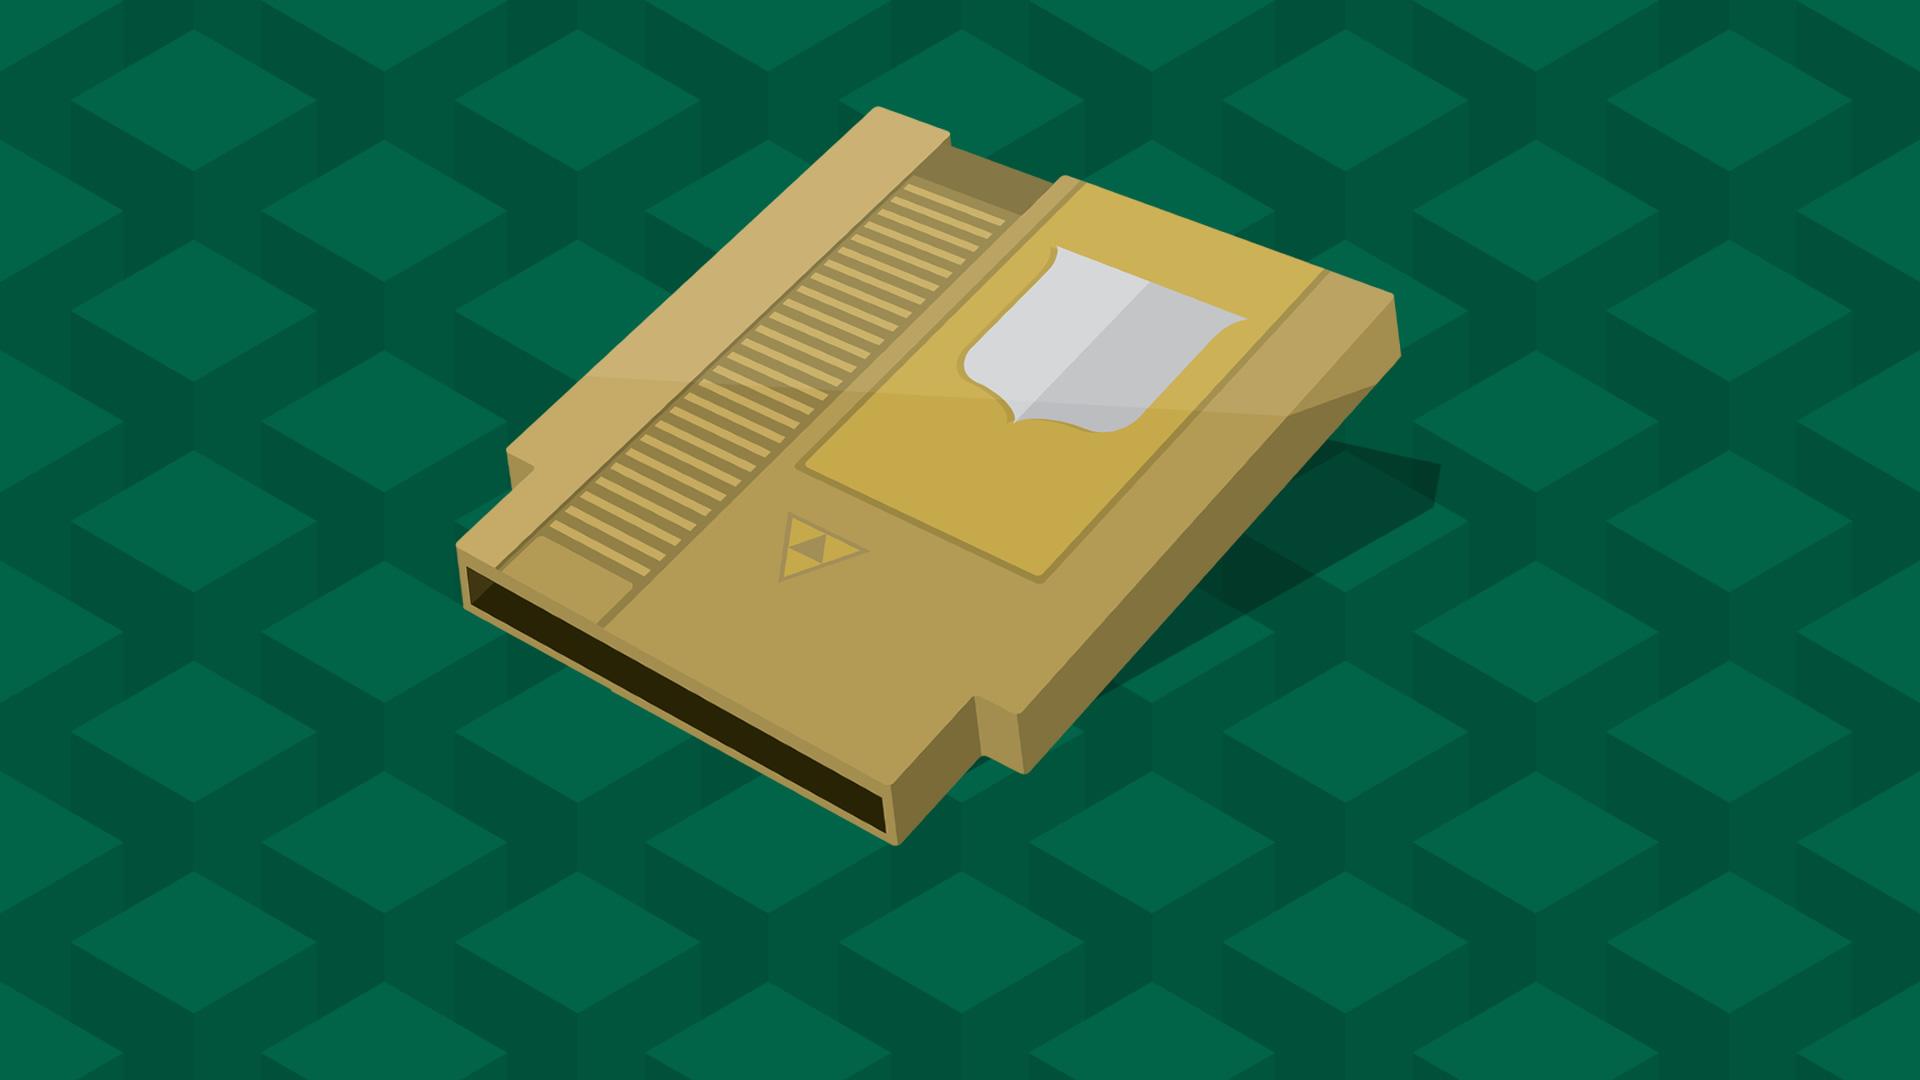 Free Download: 8 of the Best Zelda Quotes